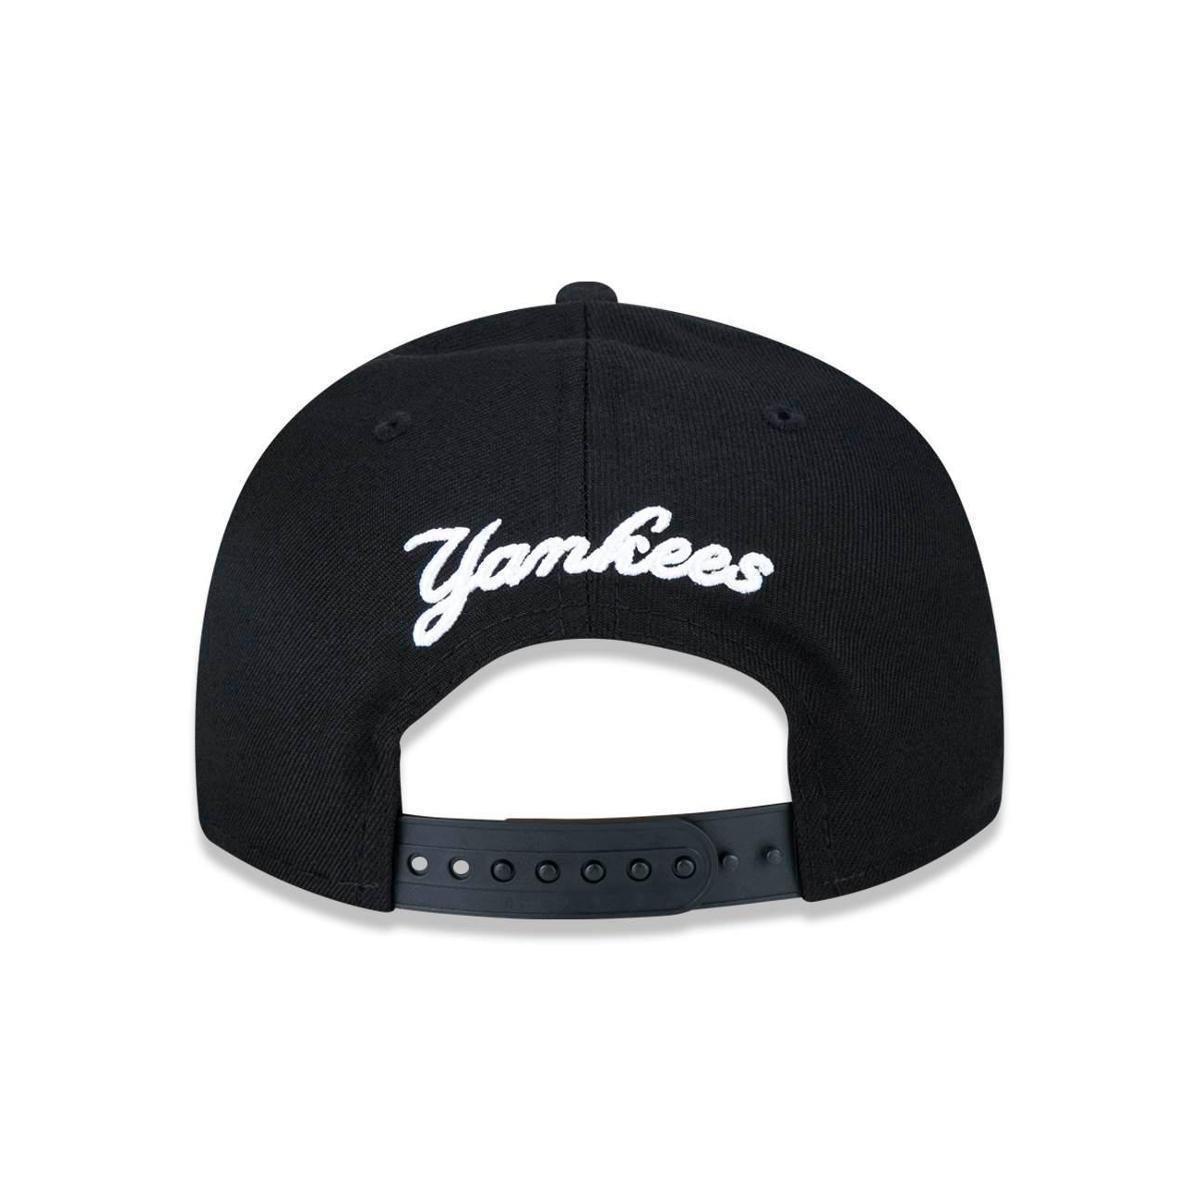 Bone 950 Original Fit New York Yankees MLB New Era - Compre Agora ... 249b60b0d43